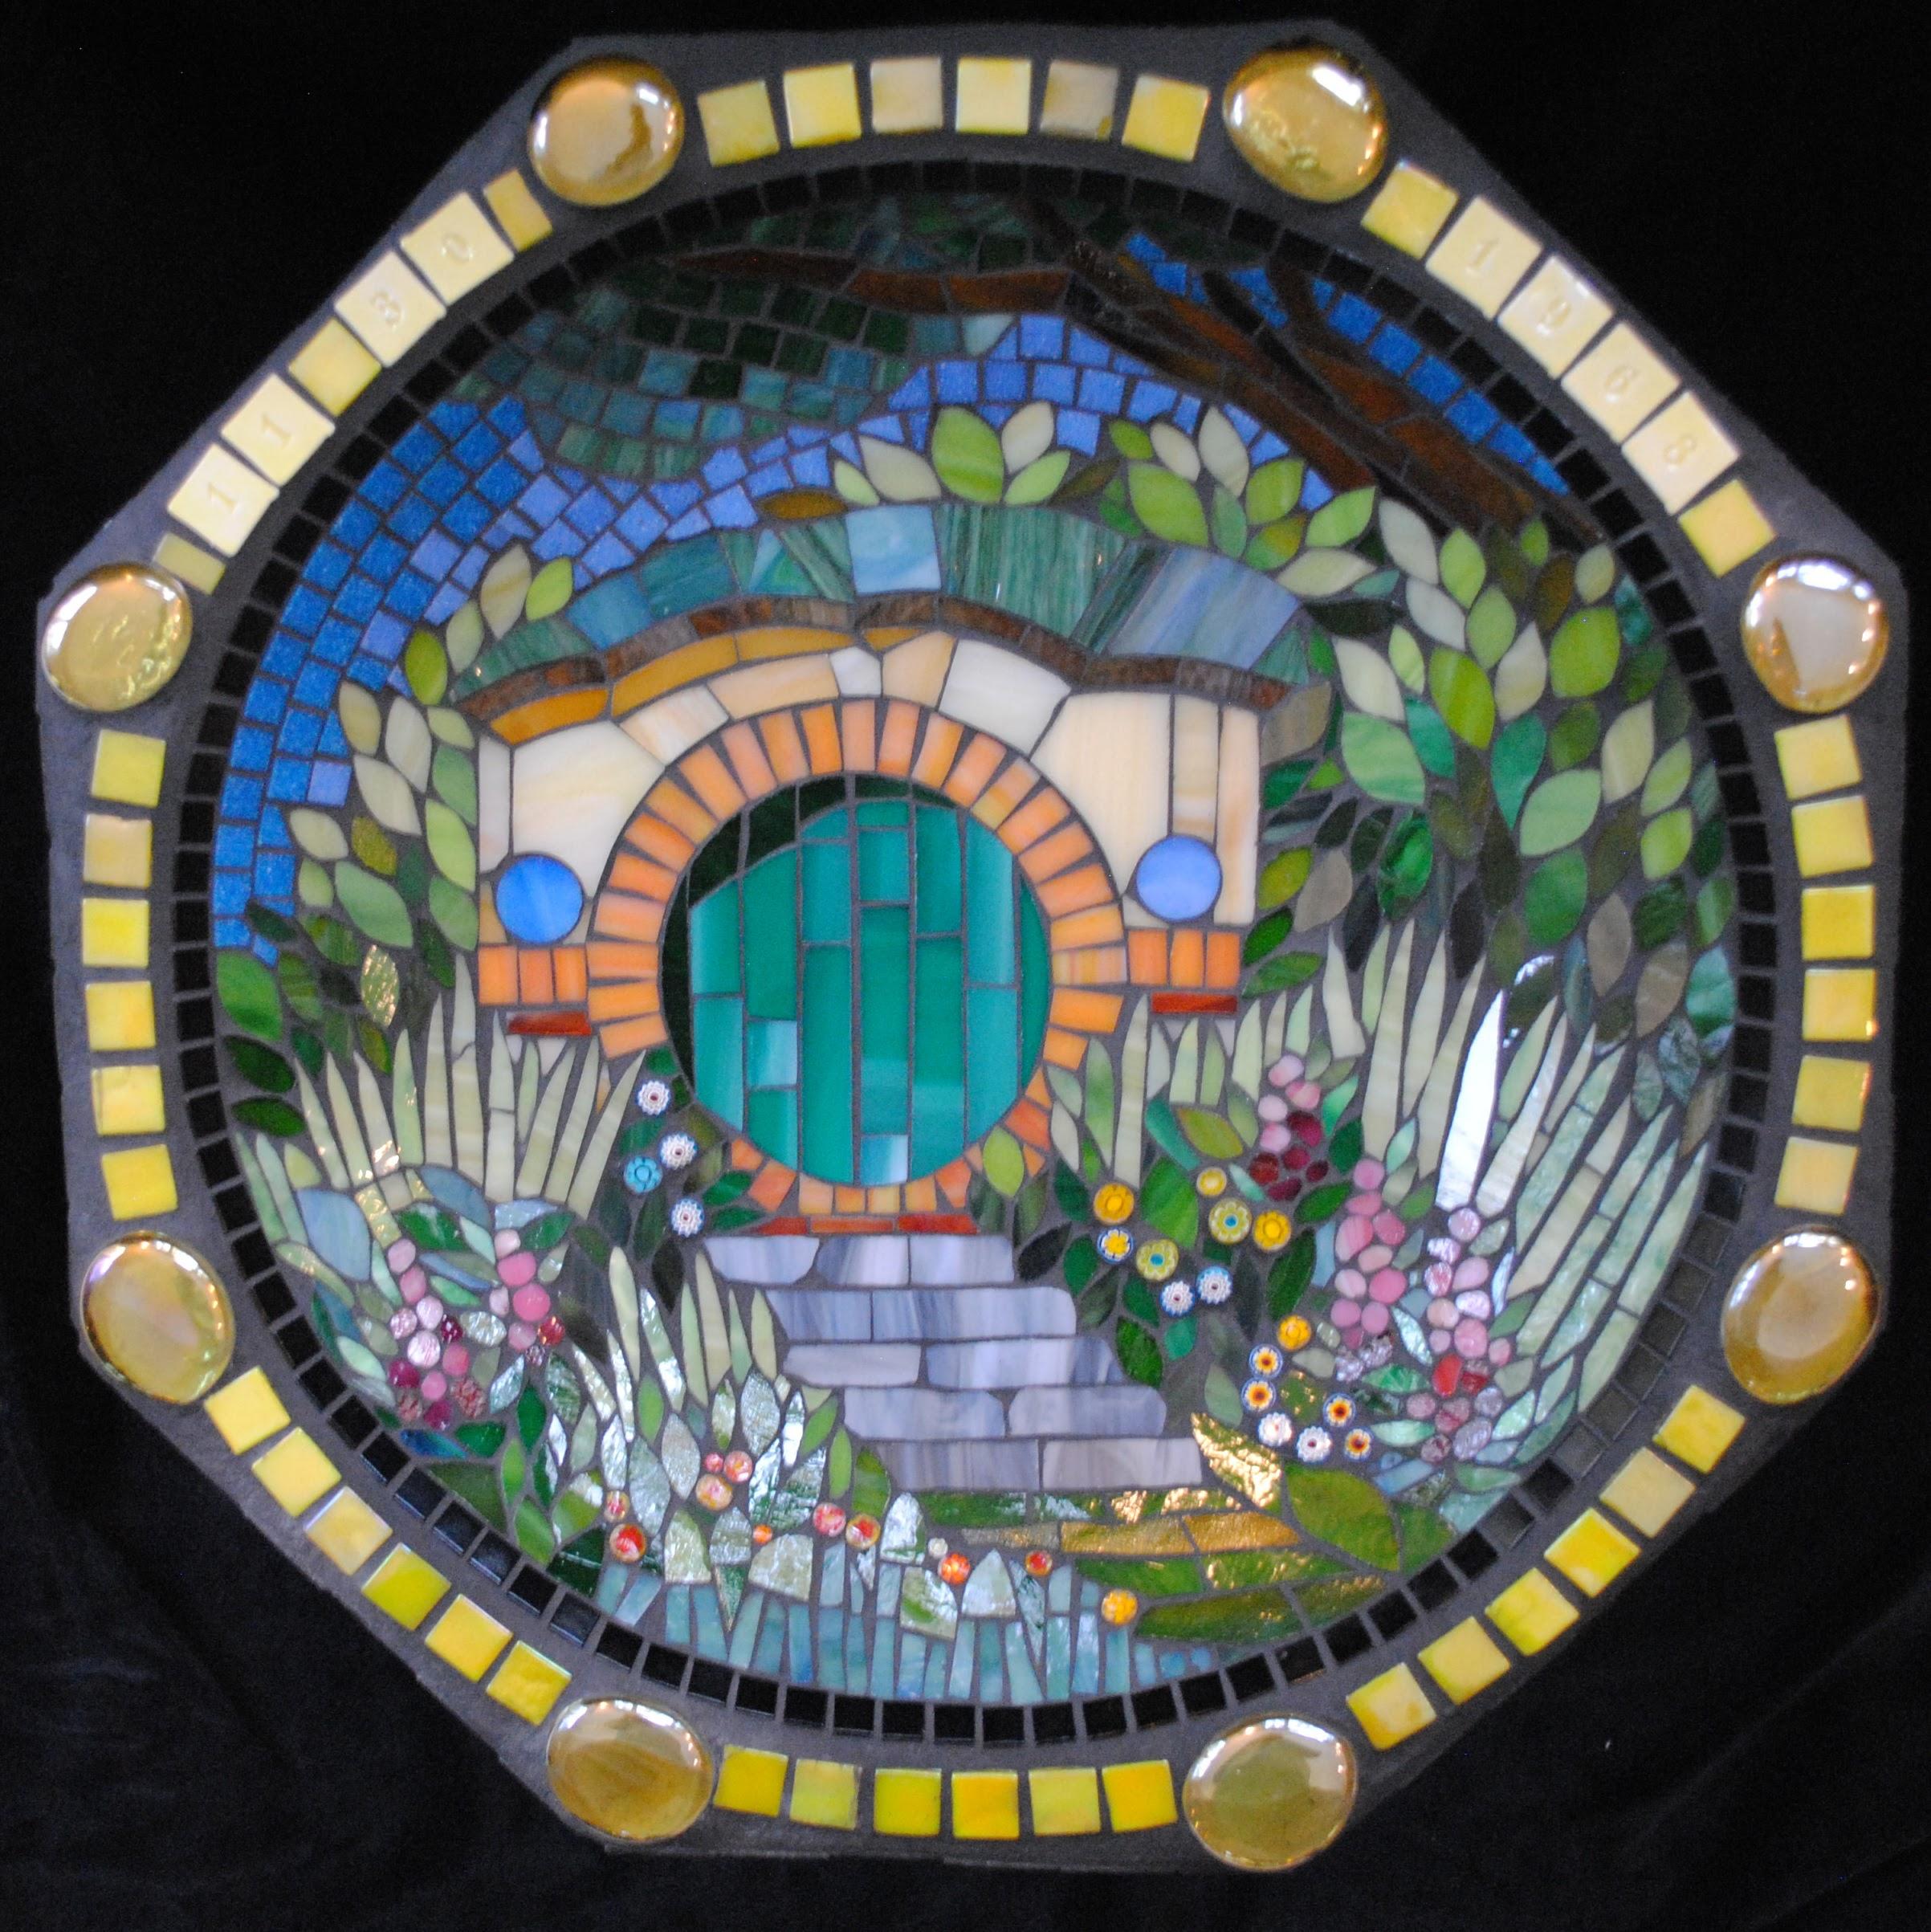 The Shire Mosaic Birdbath by Brenda Pokorny